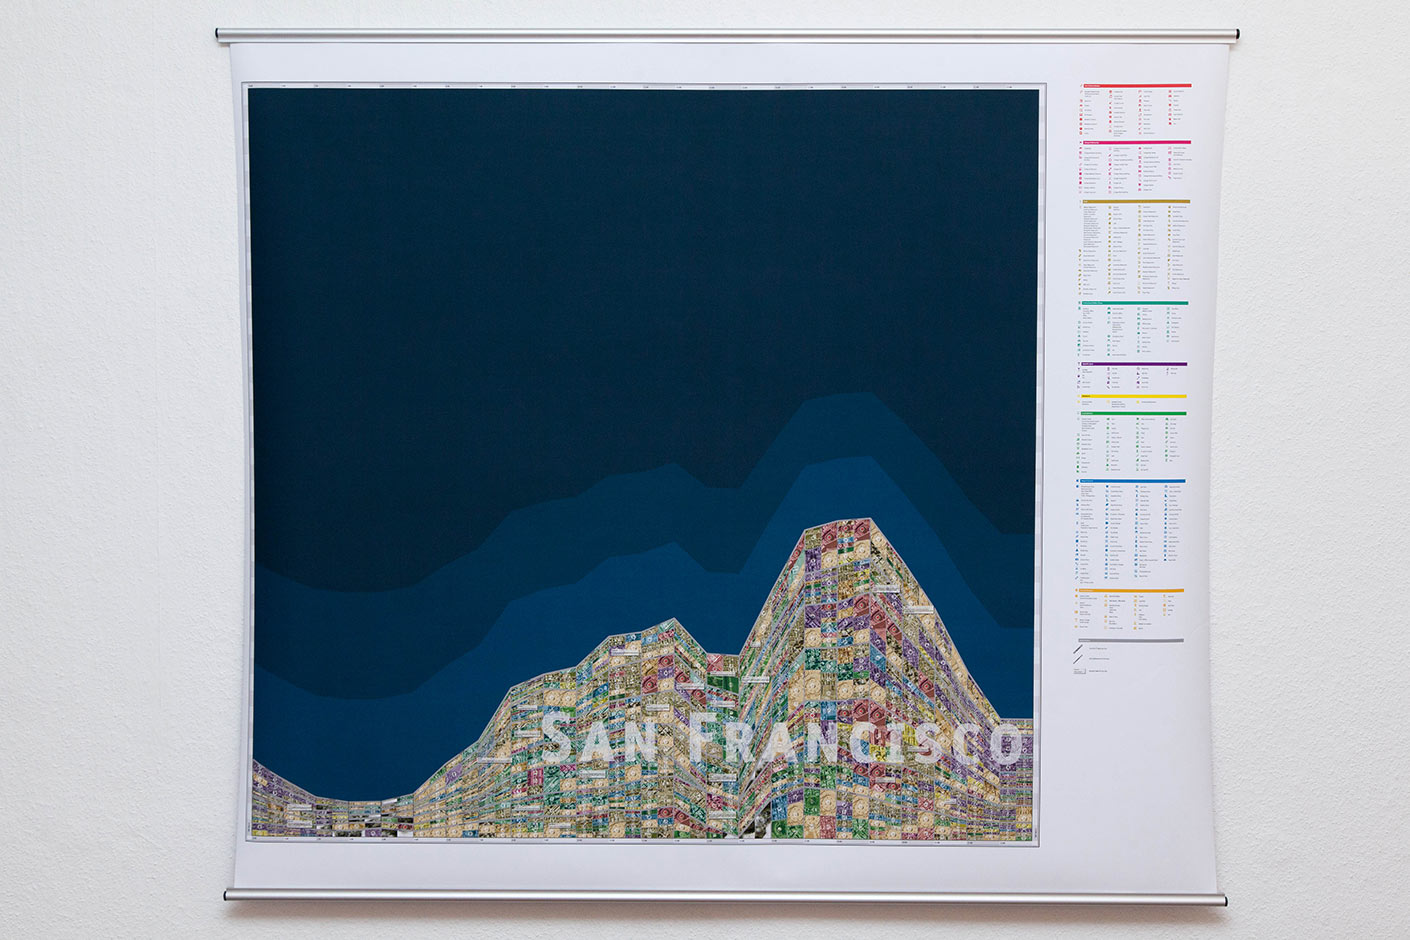 Gegenwärtige Stadtkartographie | San Francisco